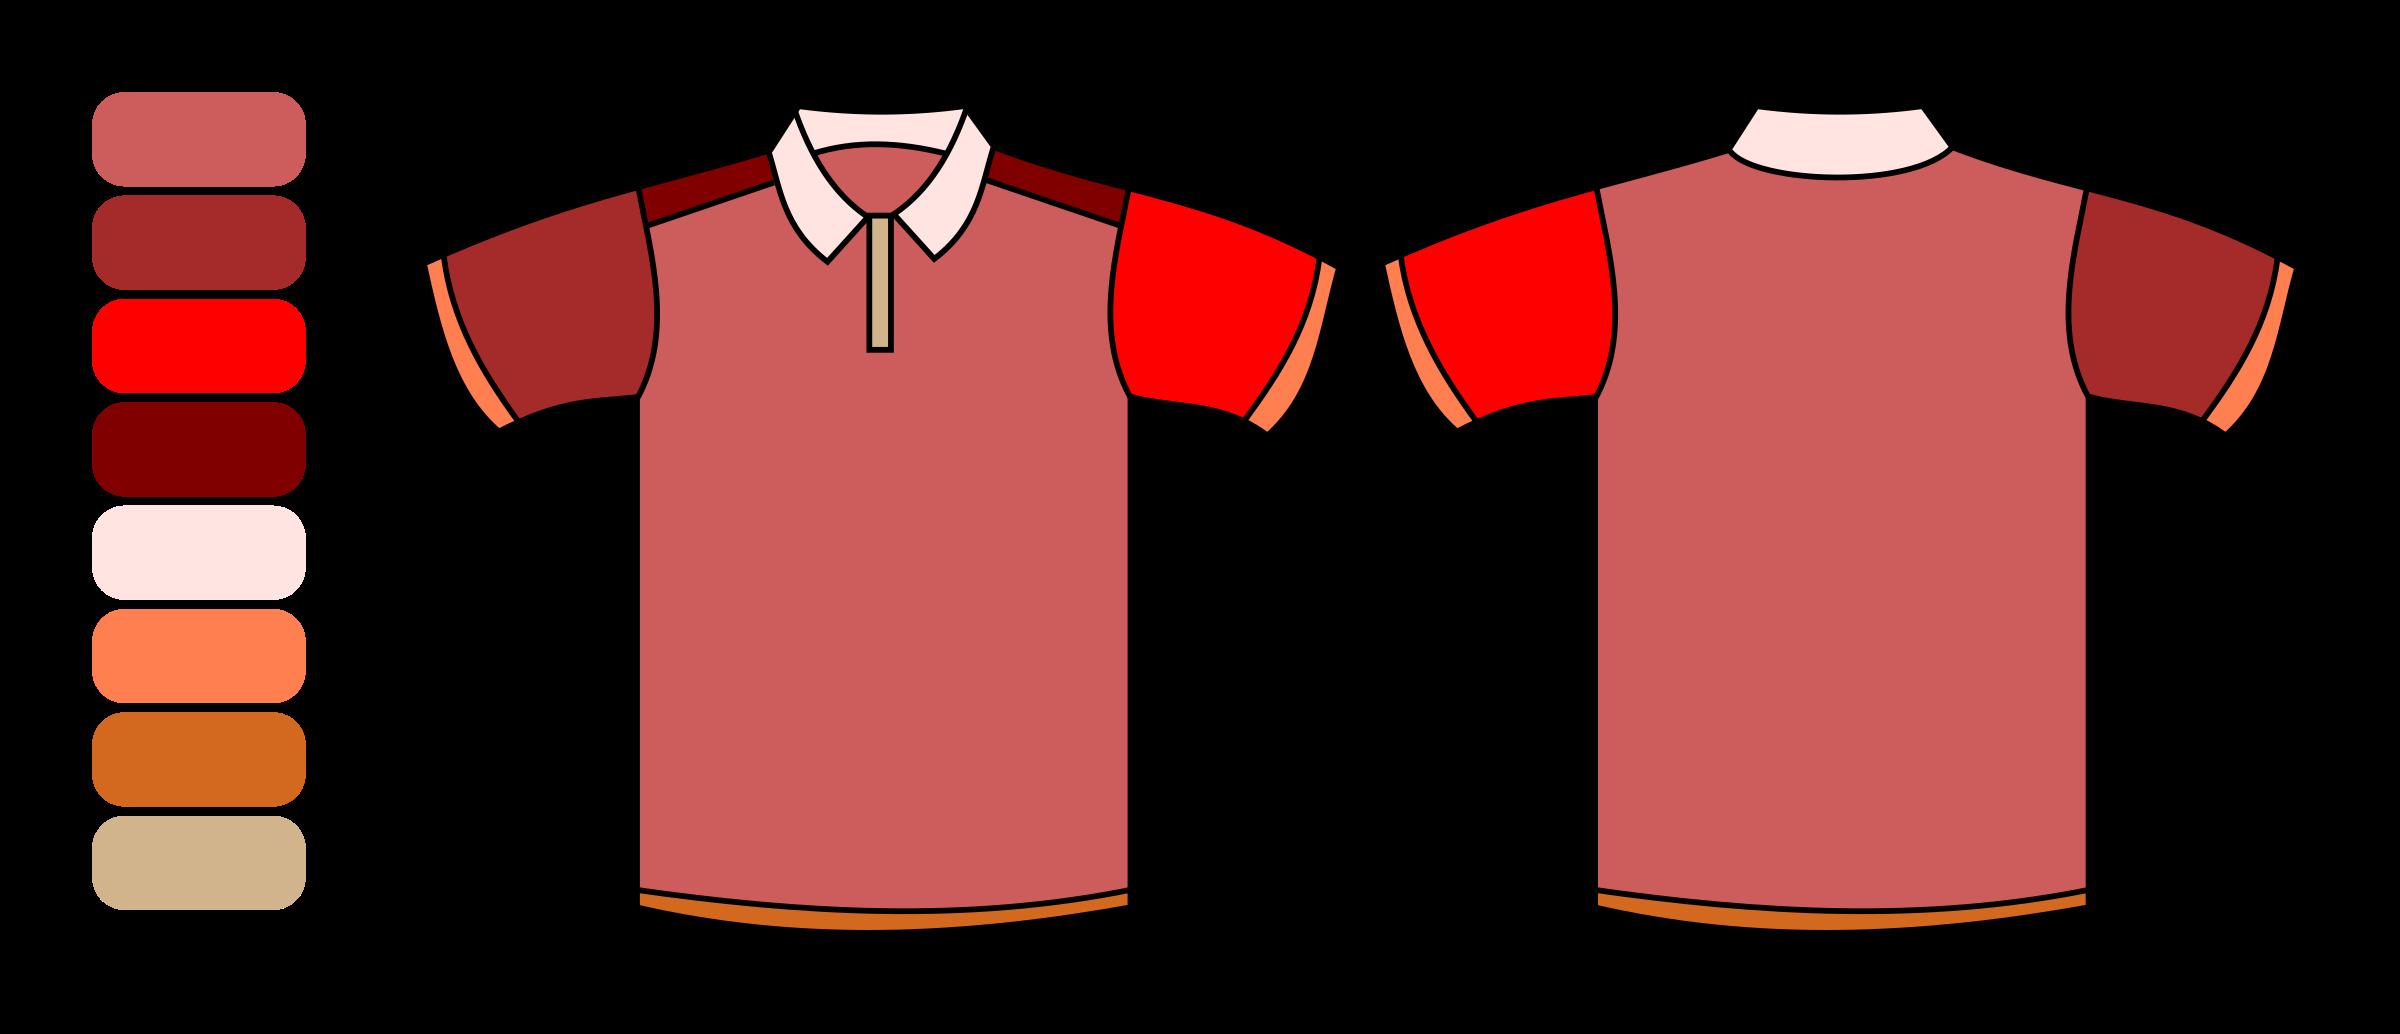 Clipart shirt uniform. Icons free on dumielauxepices